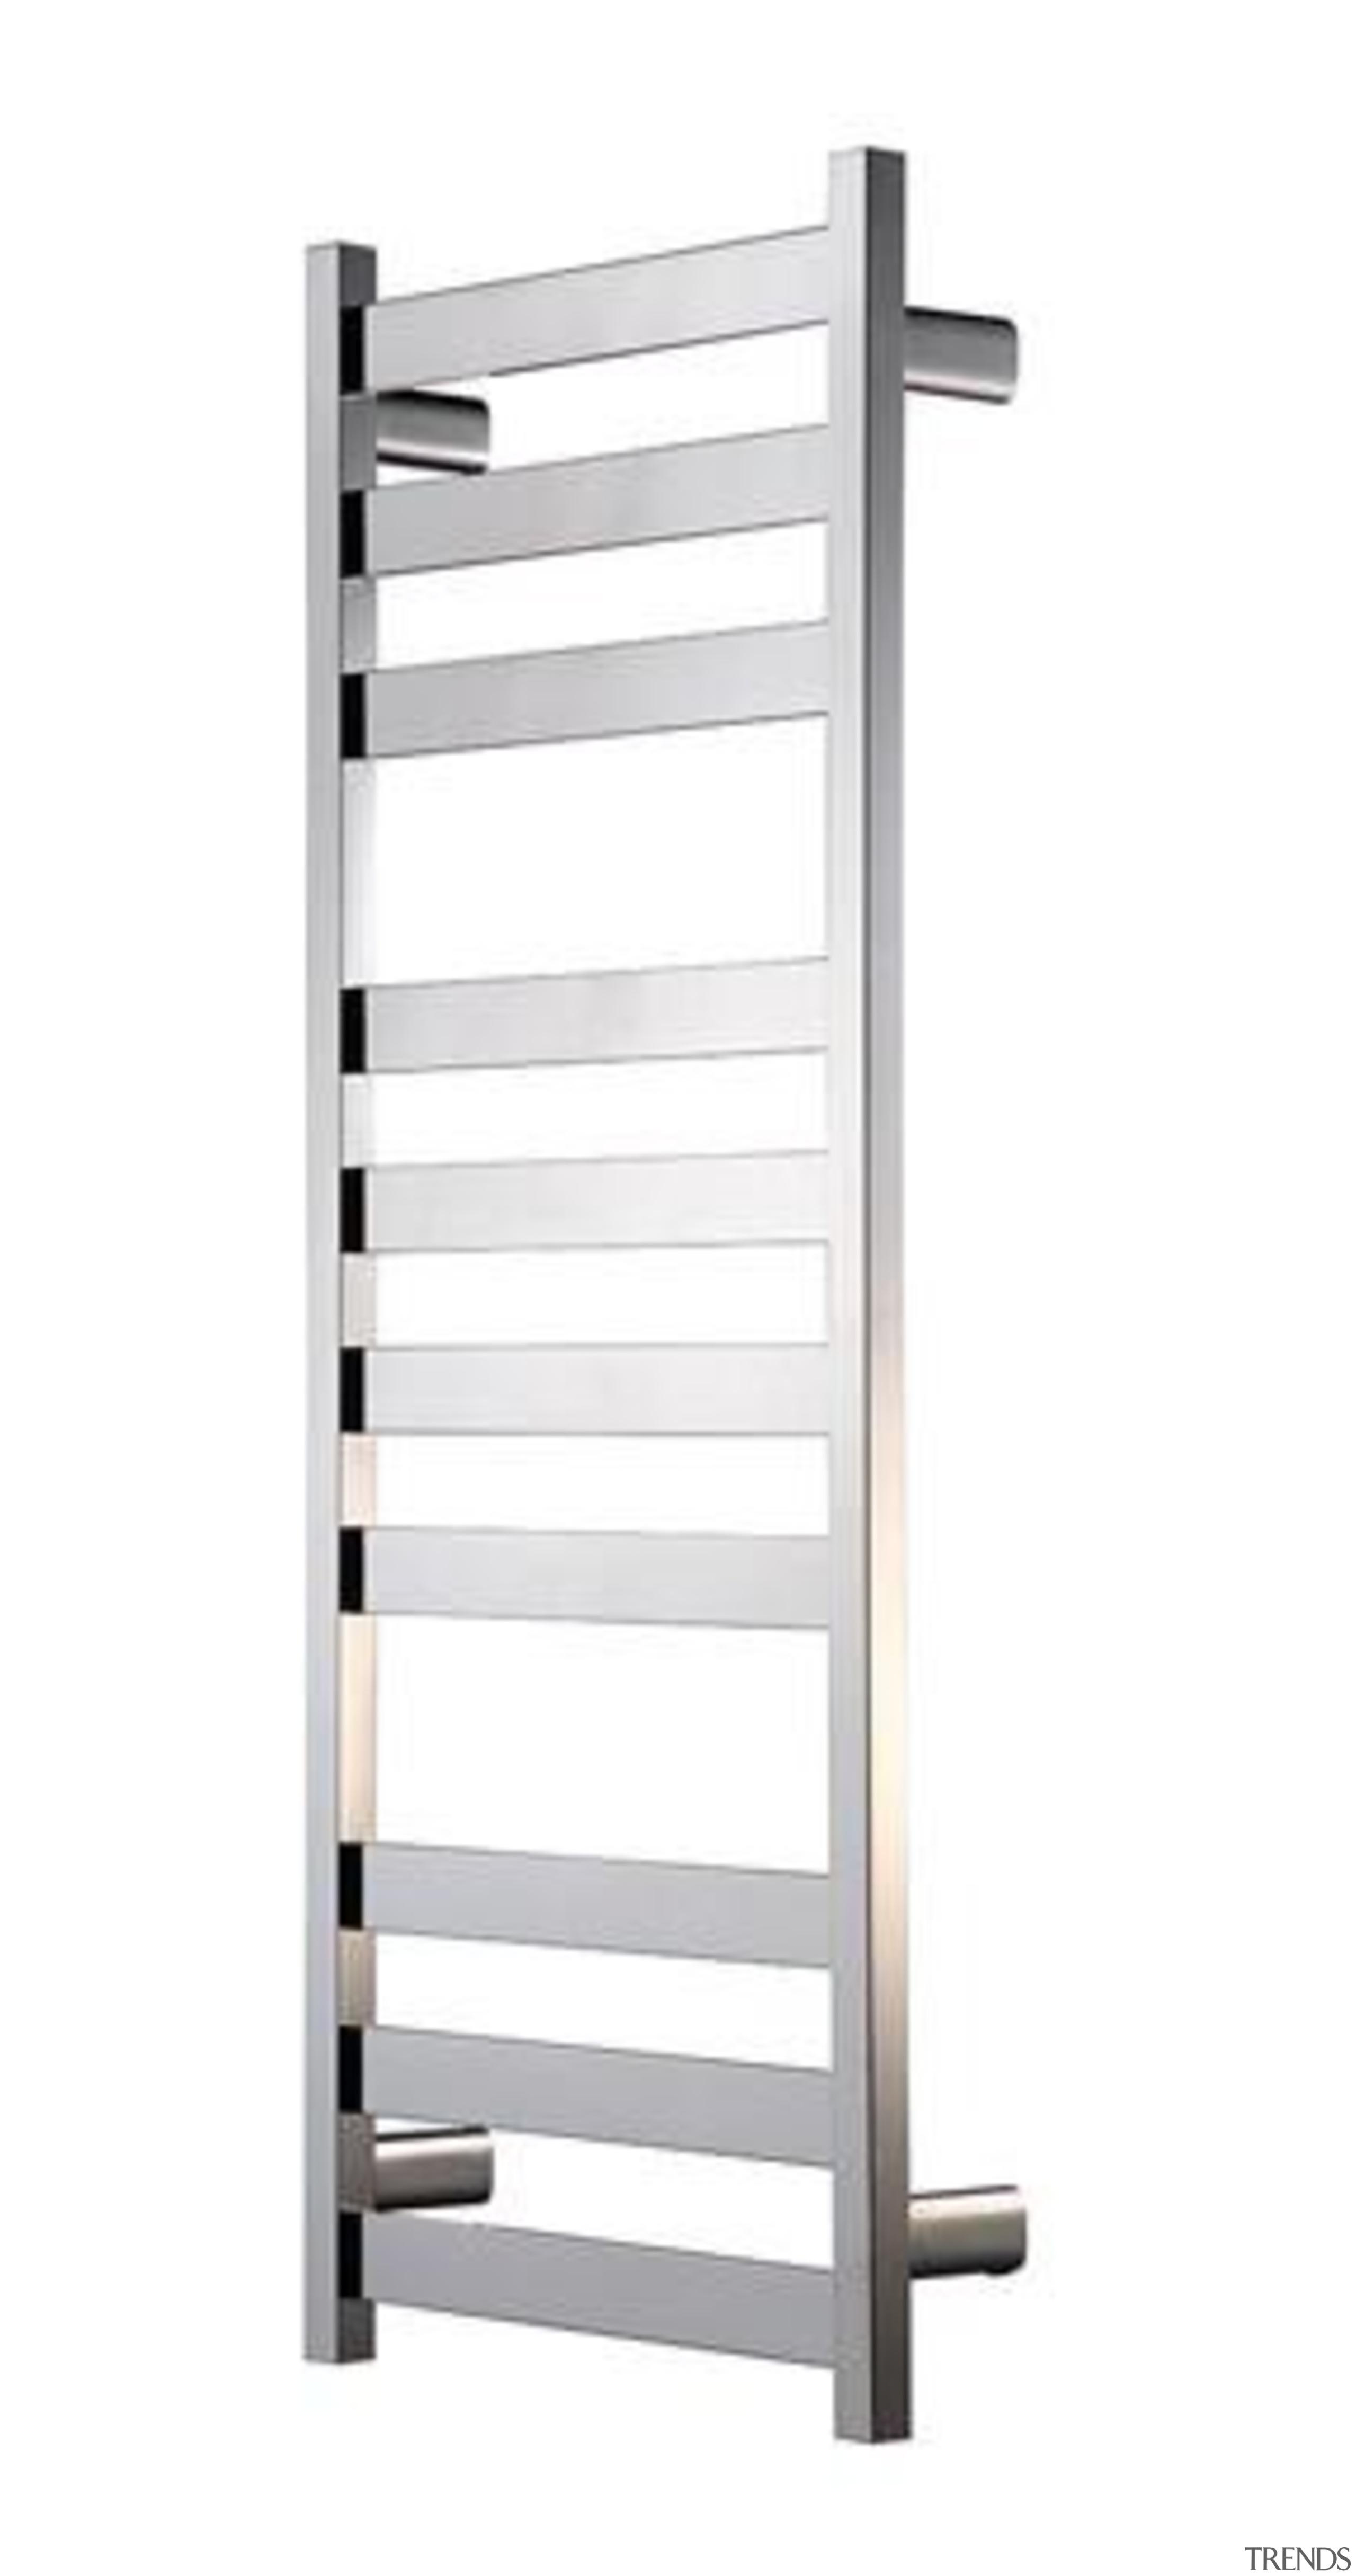 Loft 1220 Slimline Towel Warmer - Loft 1220 product, white